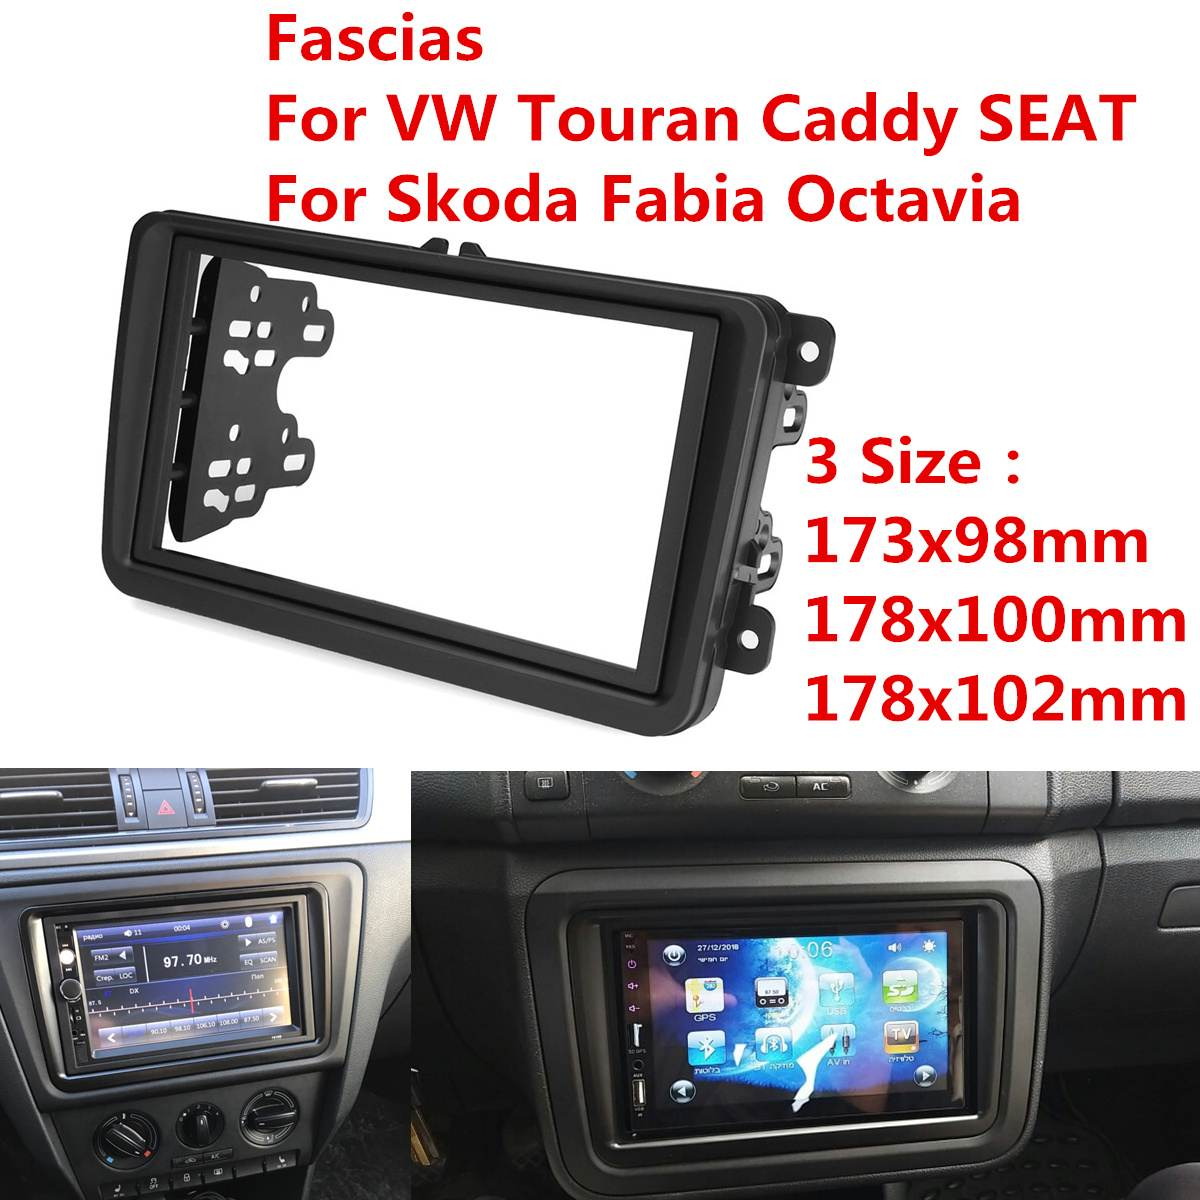 2 Din カーラジオ筋膜フェイシャパネルフレーム CD DVD ダッシュオーディオインテリアフォルクスワーゲン VW Touran Caddy SEAT Skoda ファビア Octavia